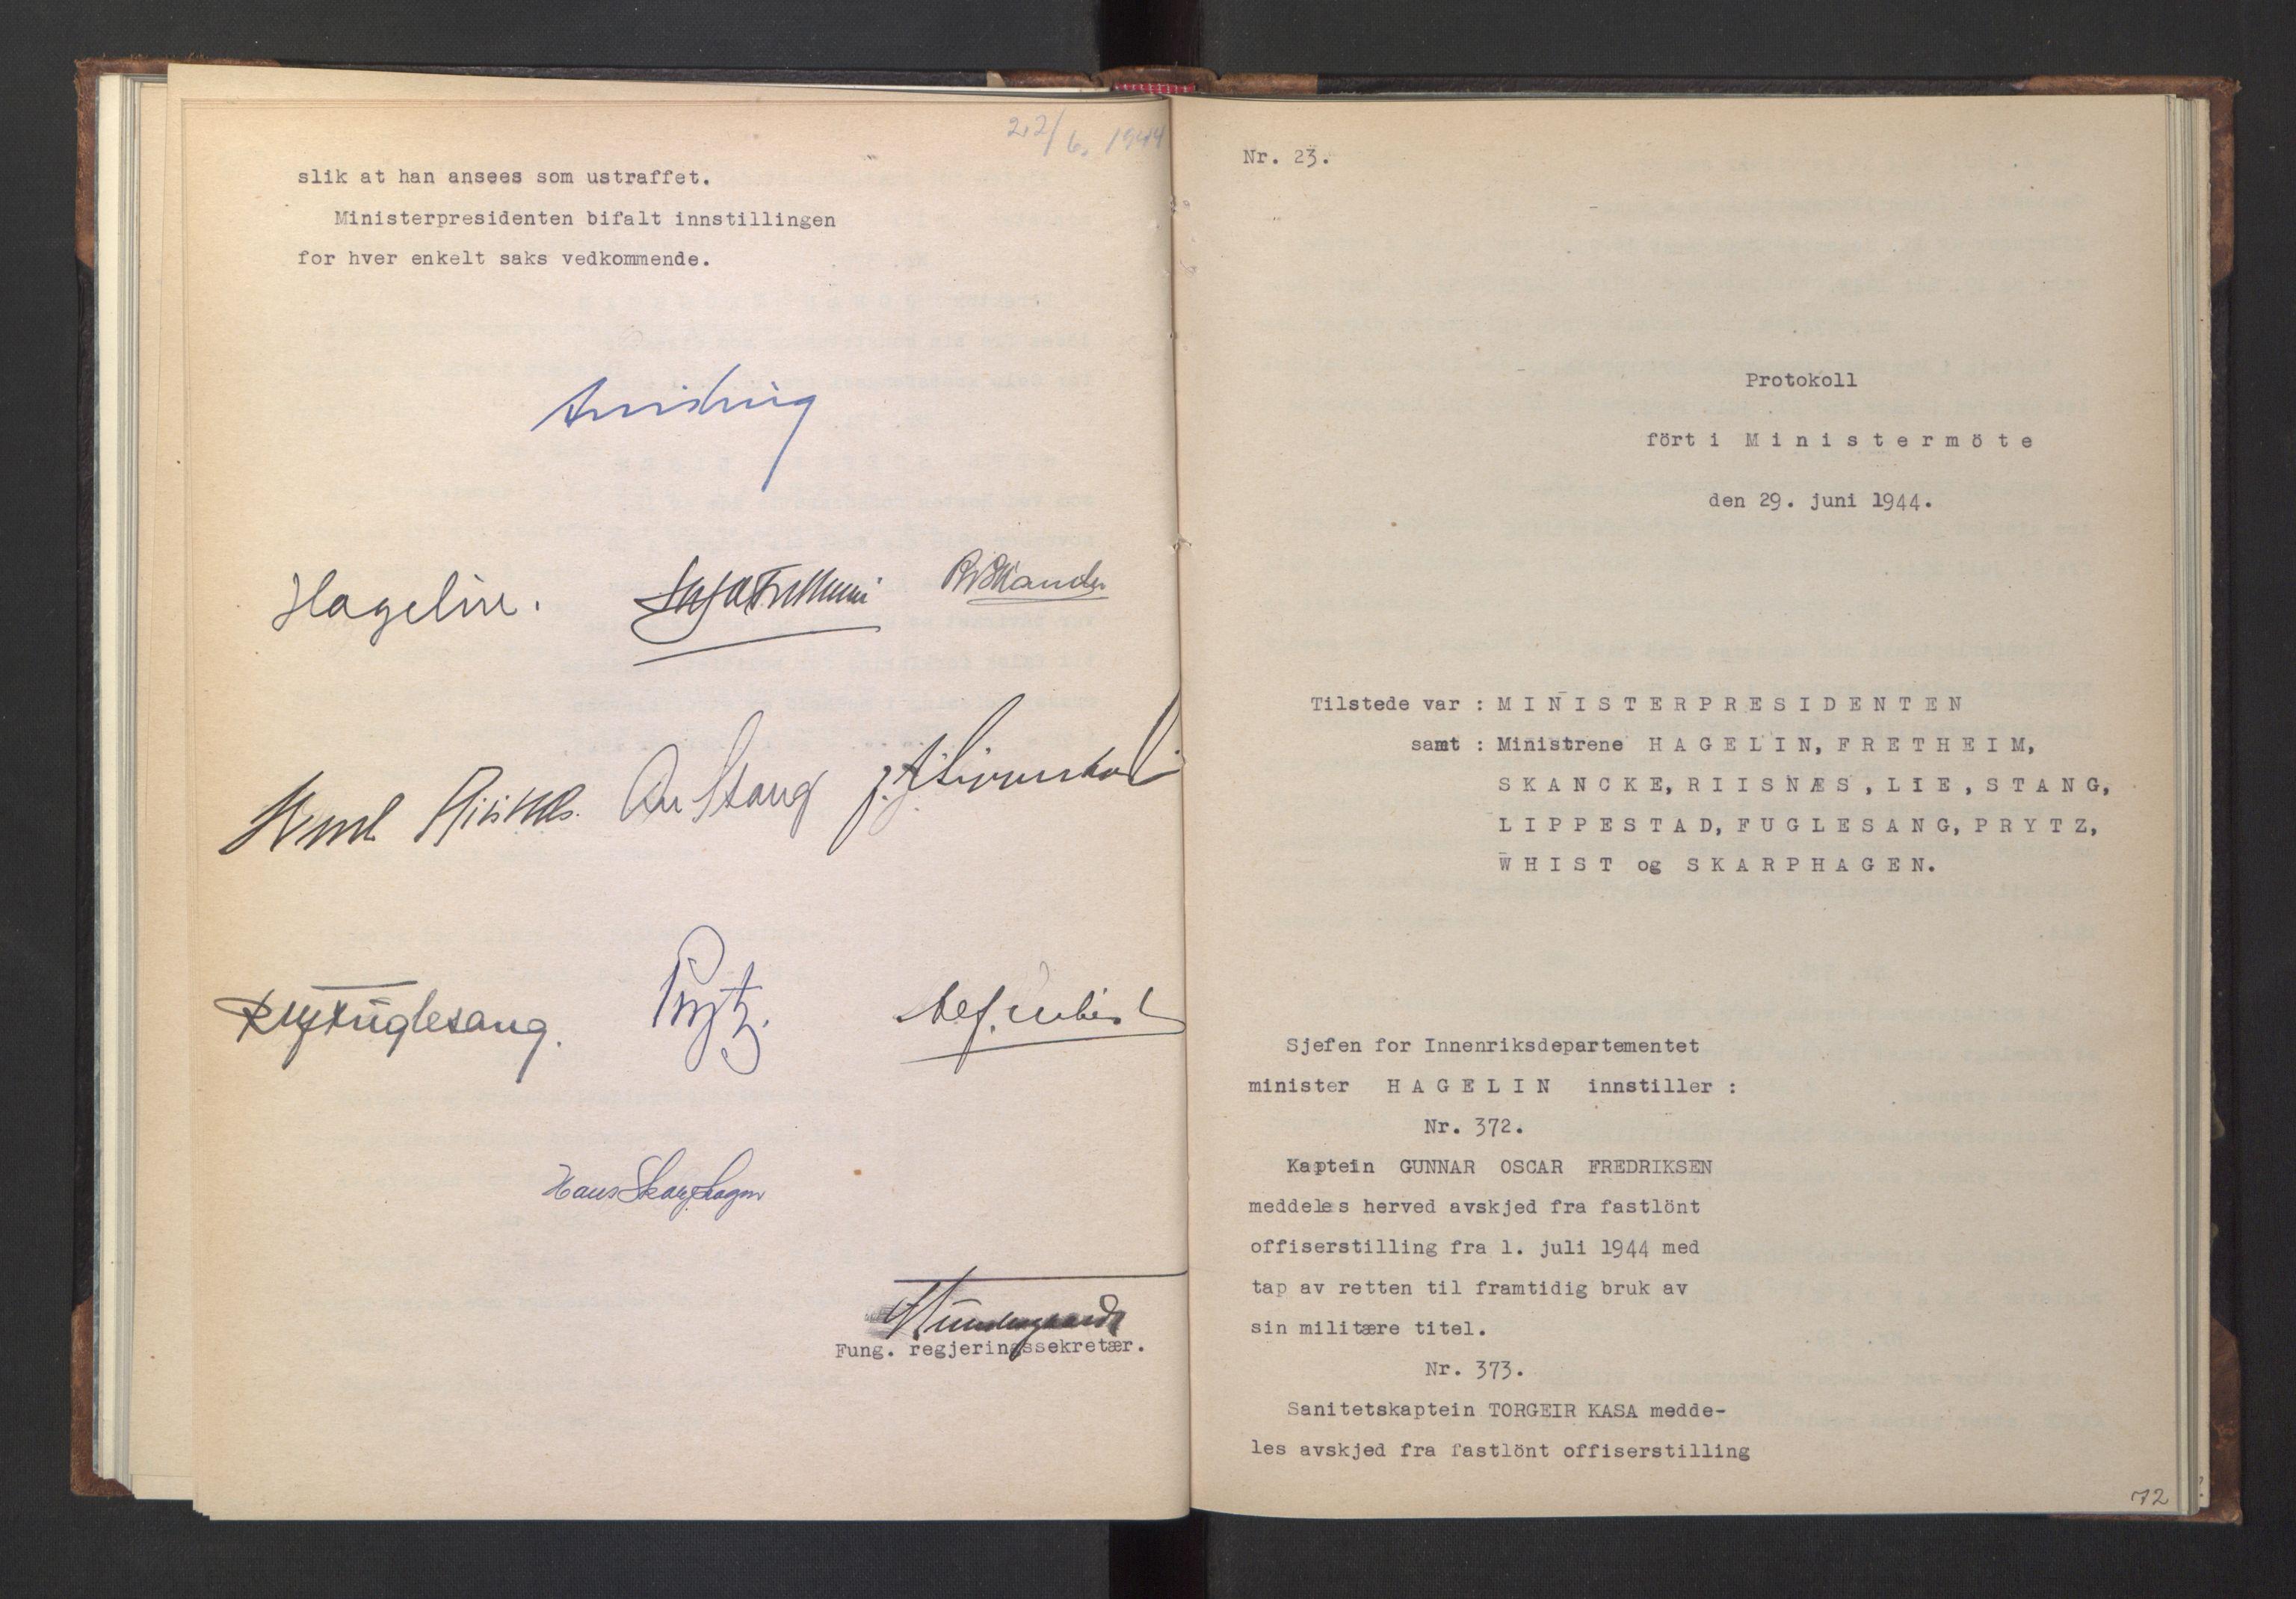 RA, NS-administrasjonen 1940-1945 (Statsrådsekretariatet, de kommisariske statsråder mm), D/Da/L0005: Protokoll fra ministermøter, 1944, s. 71b-72a